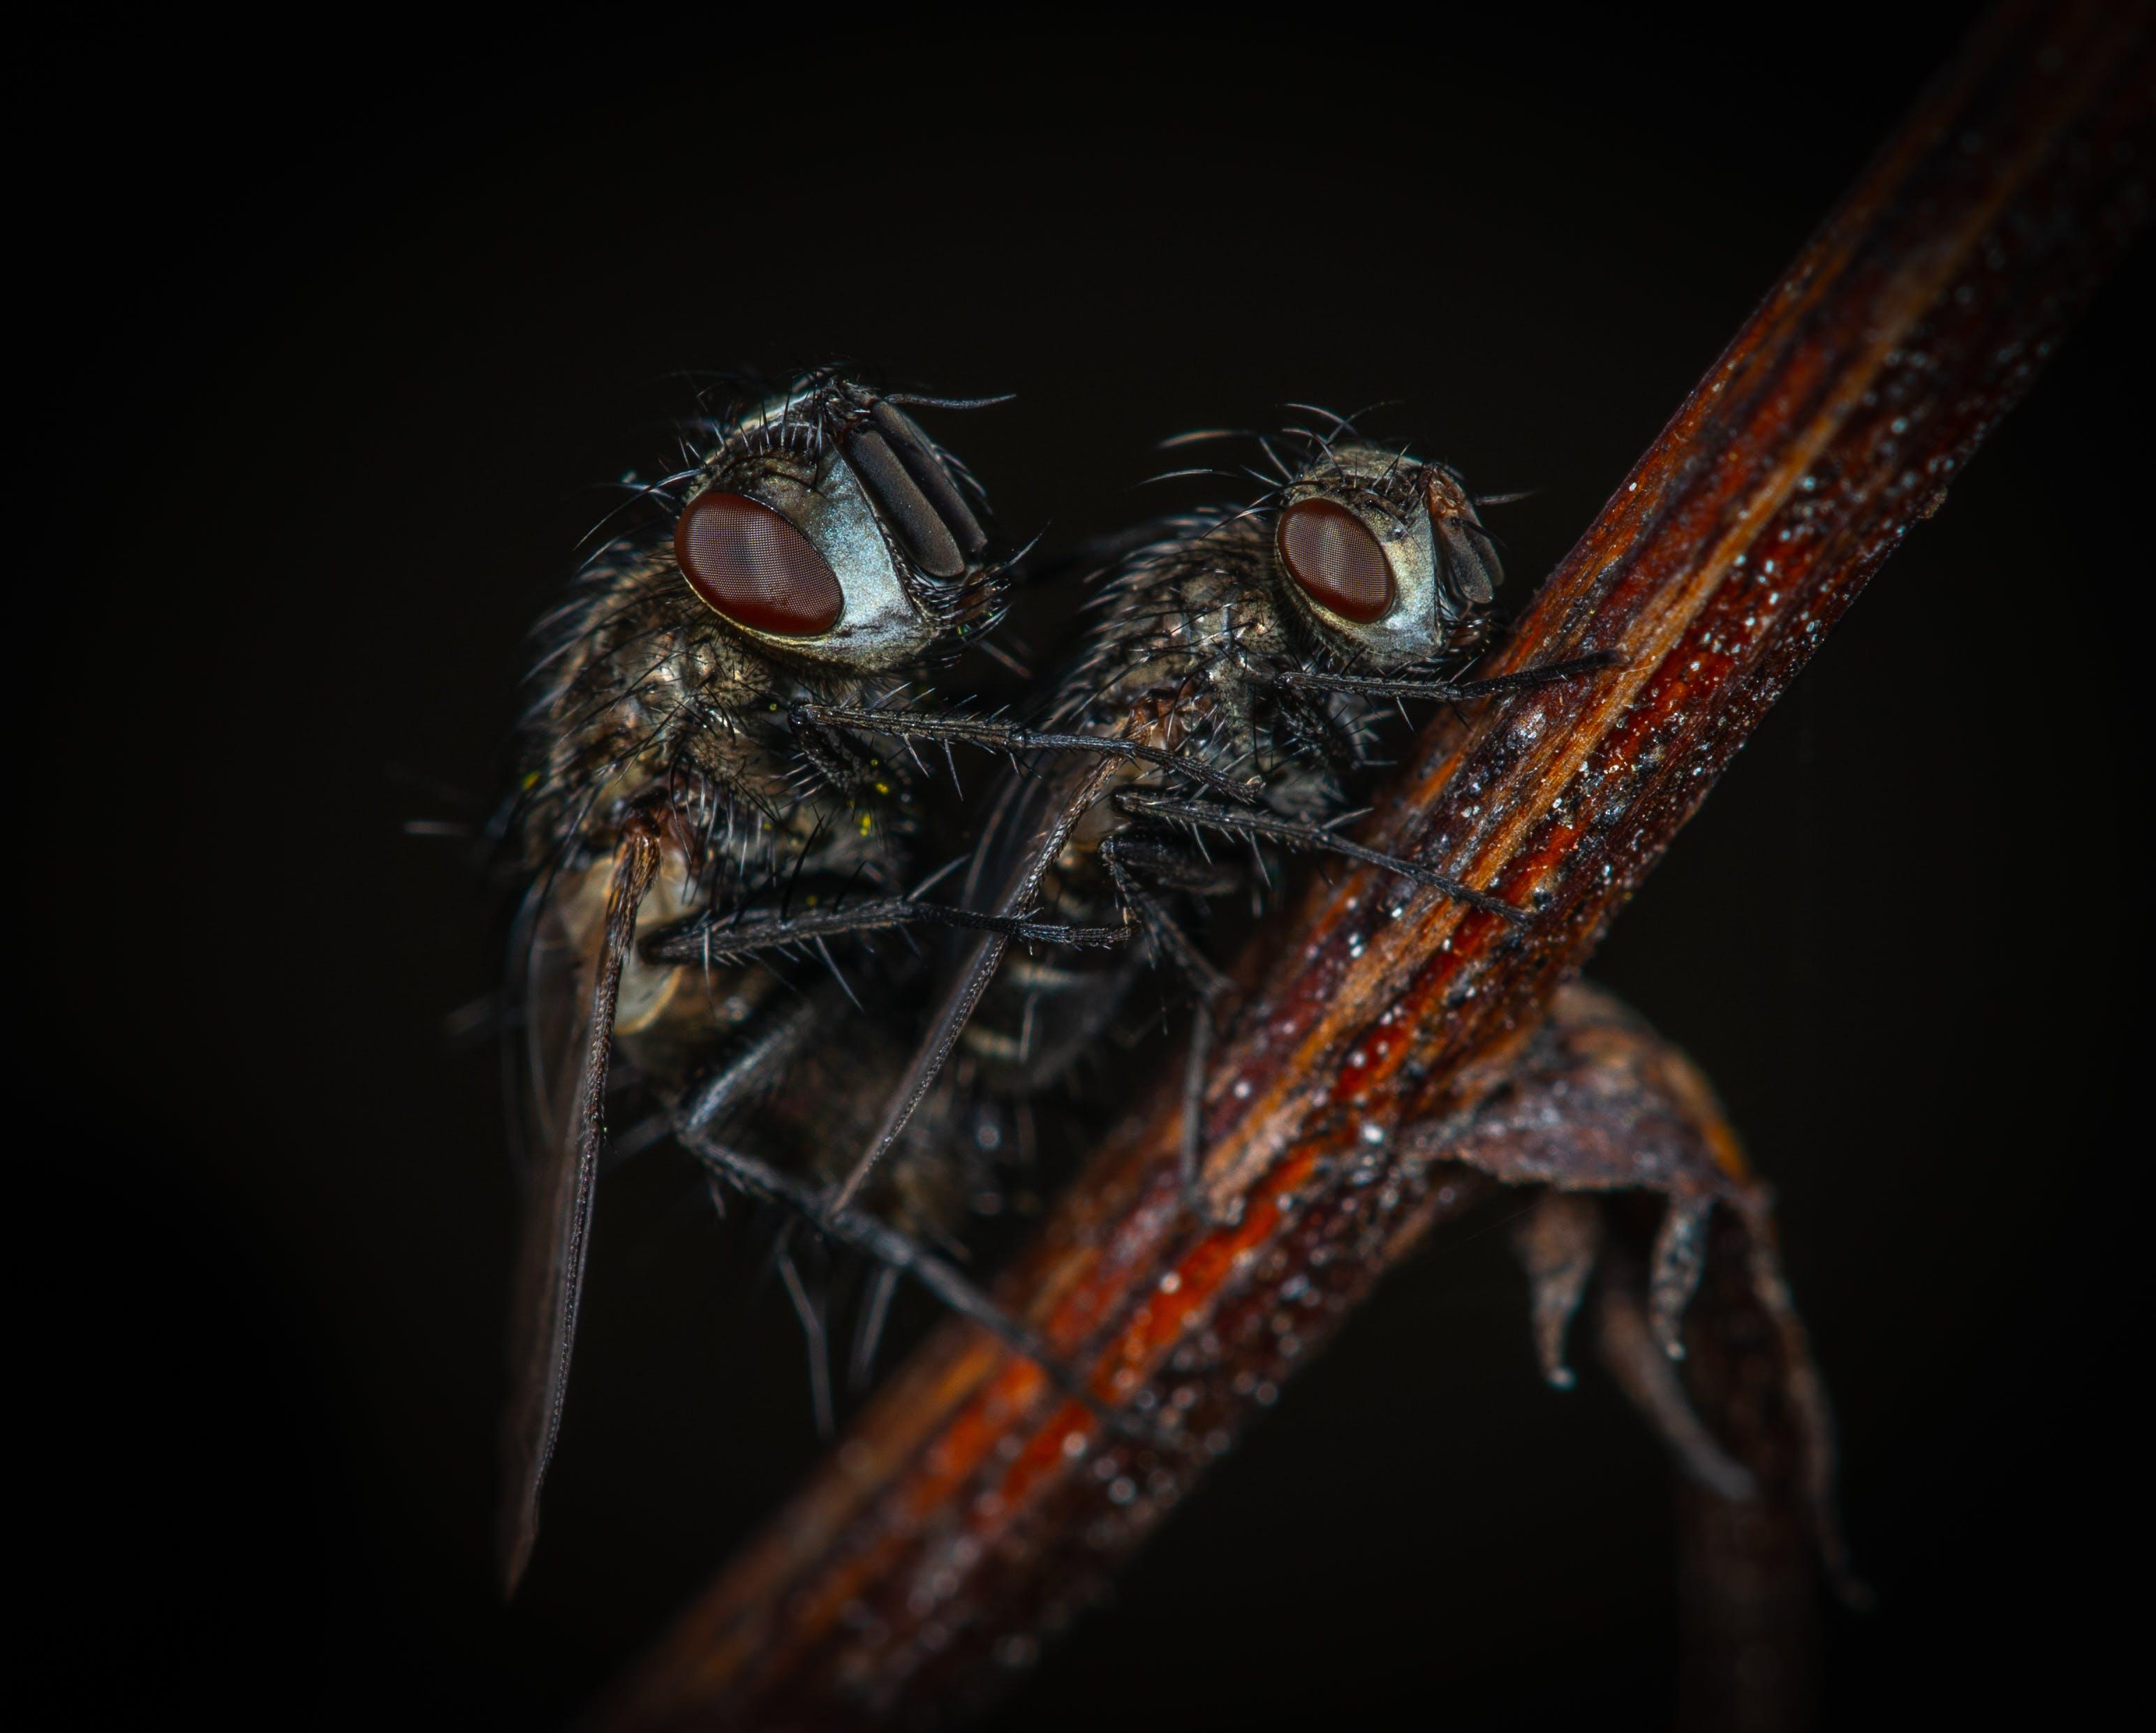 Kostenloses Stock Foto zu flügel, fokus, gruselig, insekt